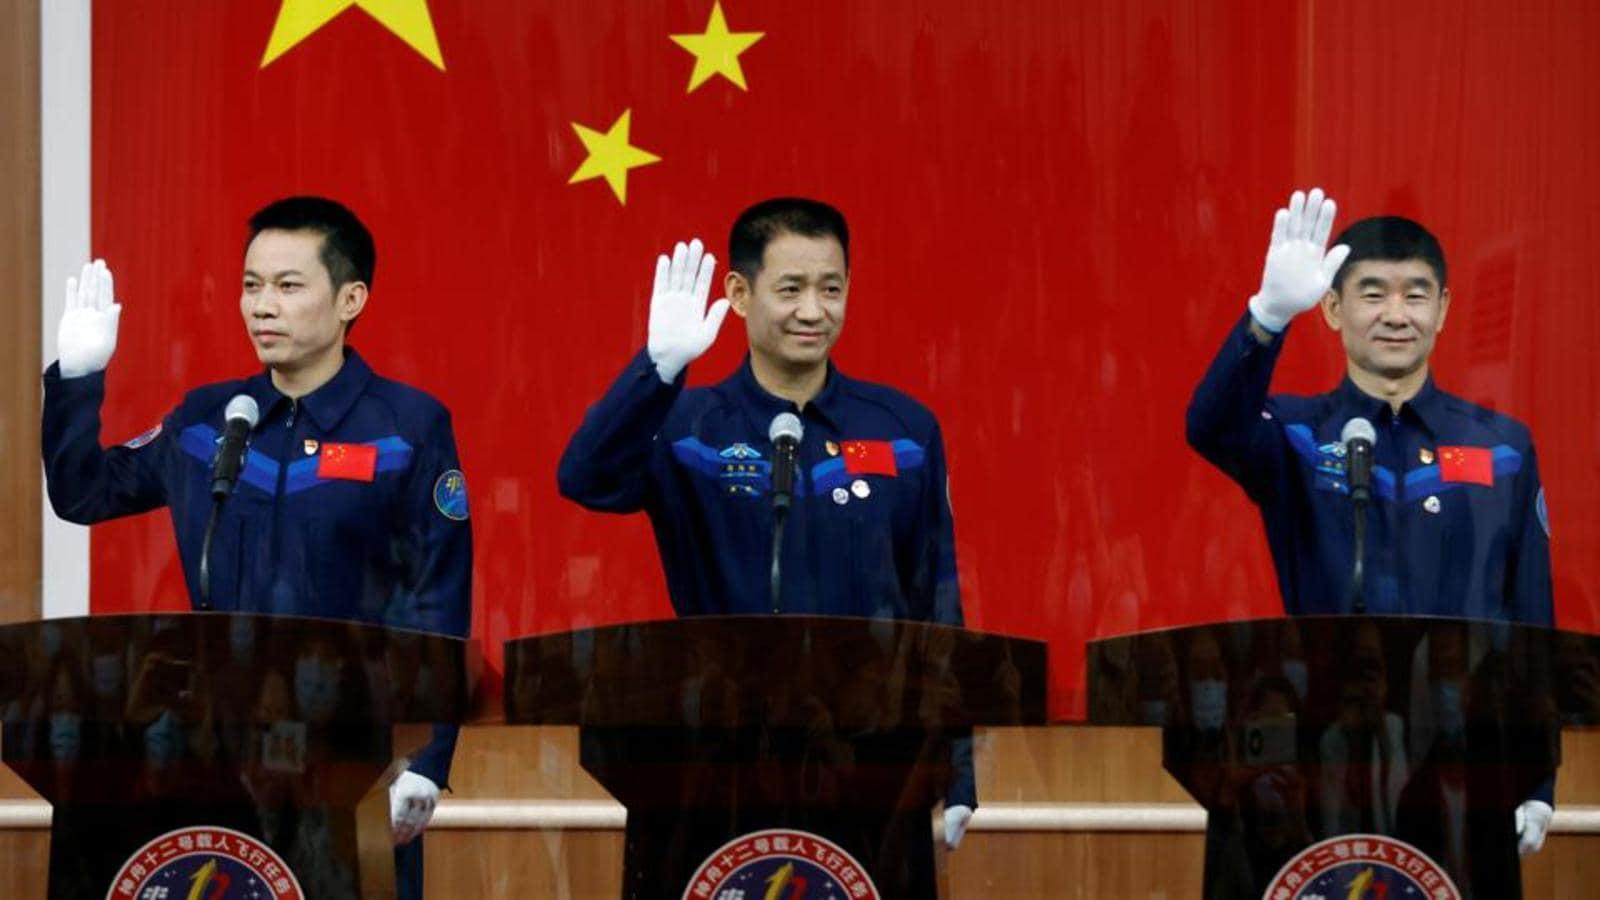 فضانوردان مأموریت شنژو-12 چین